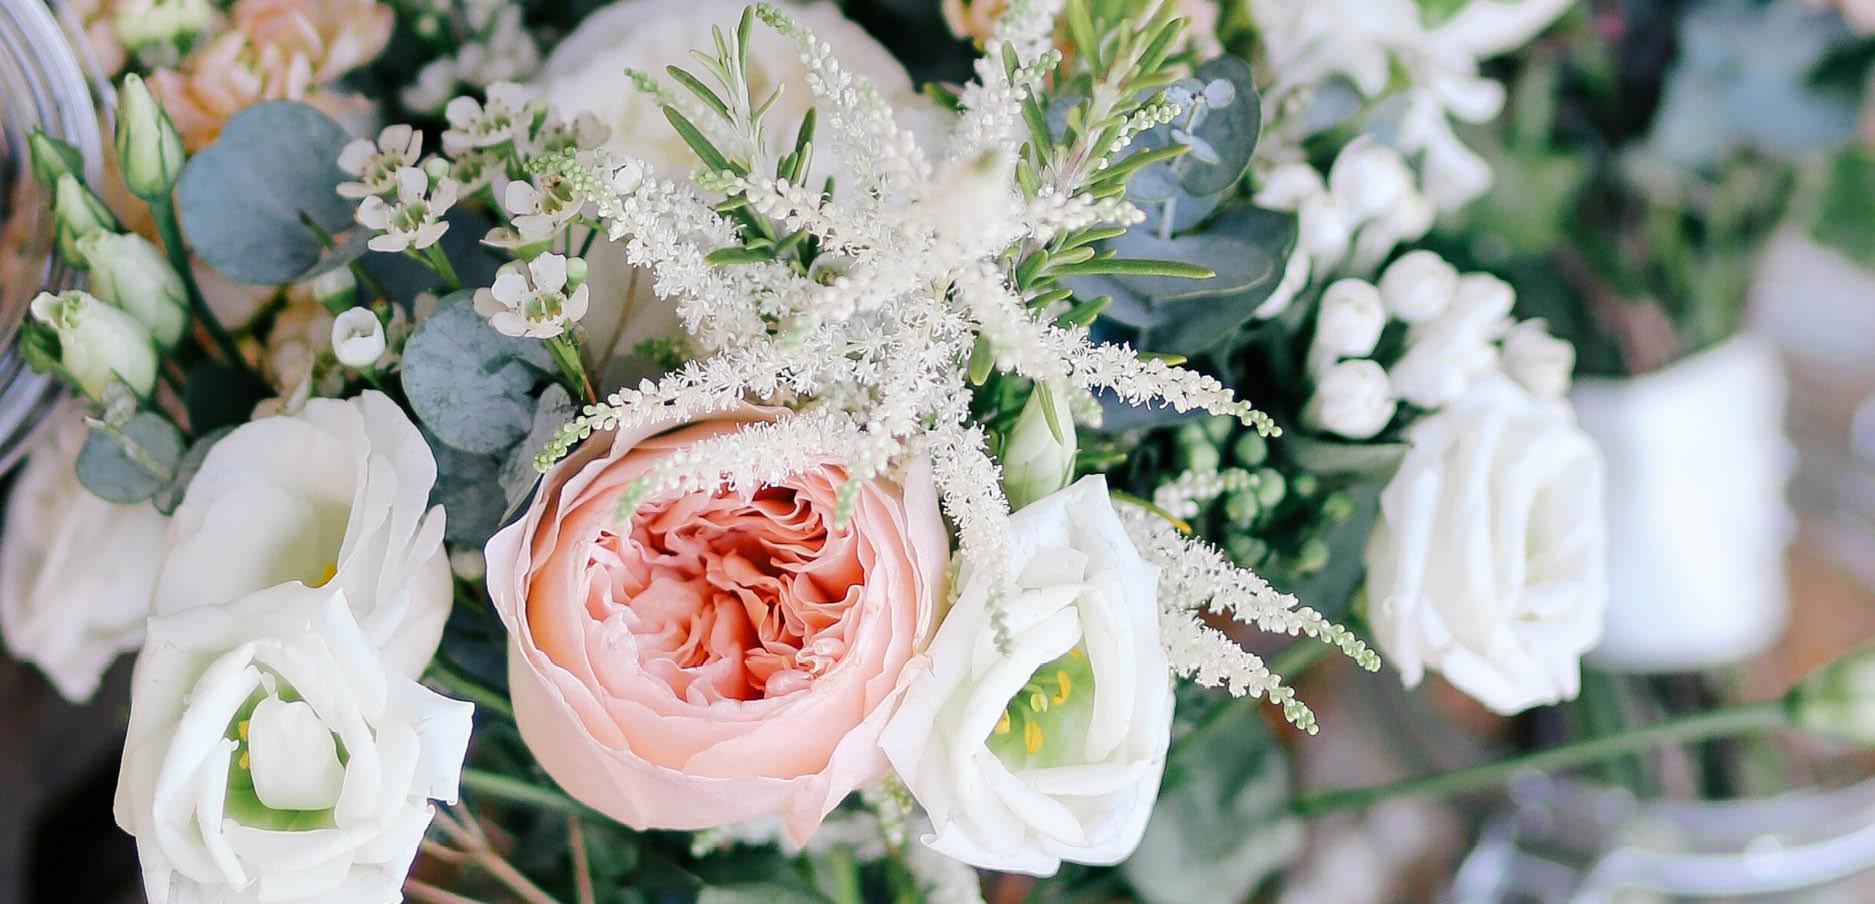 Bouquet Sposa Kate Middleton.Il Bouquet Di Kate Middleton Le Verzeletti